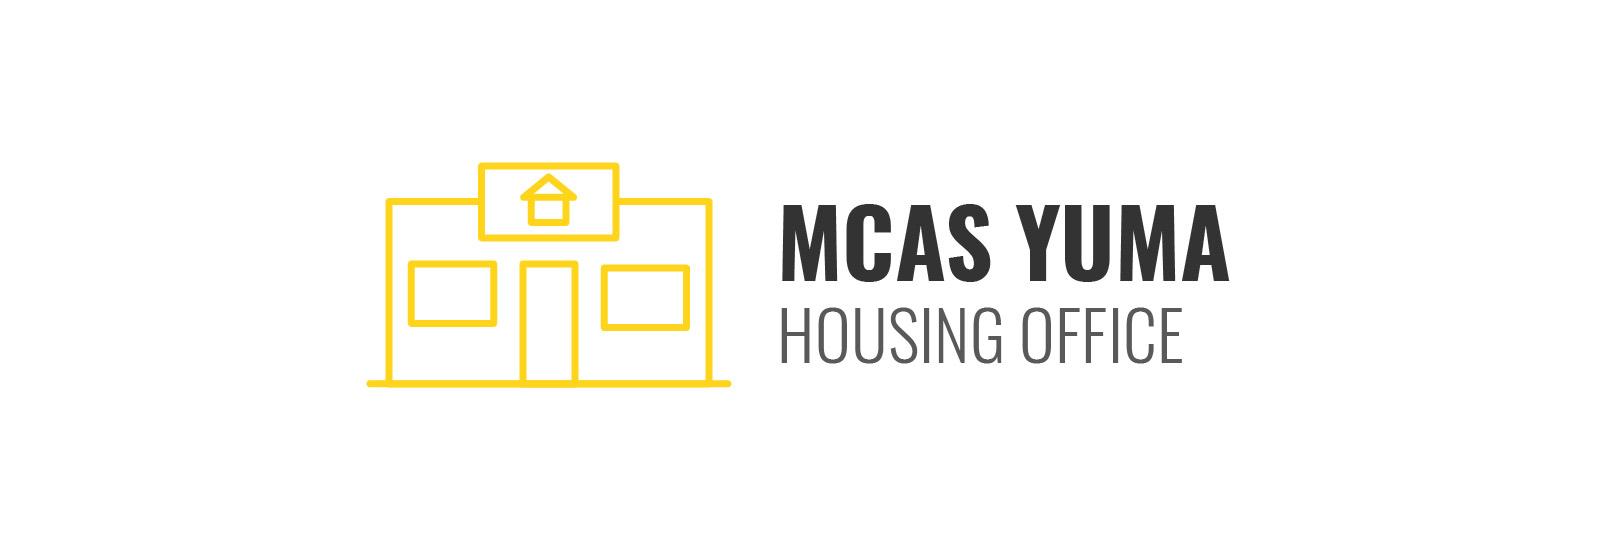 MCAS Yuma Housing Office